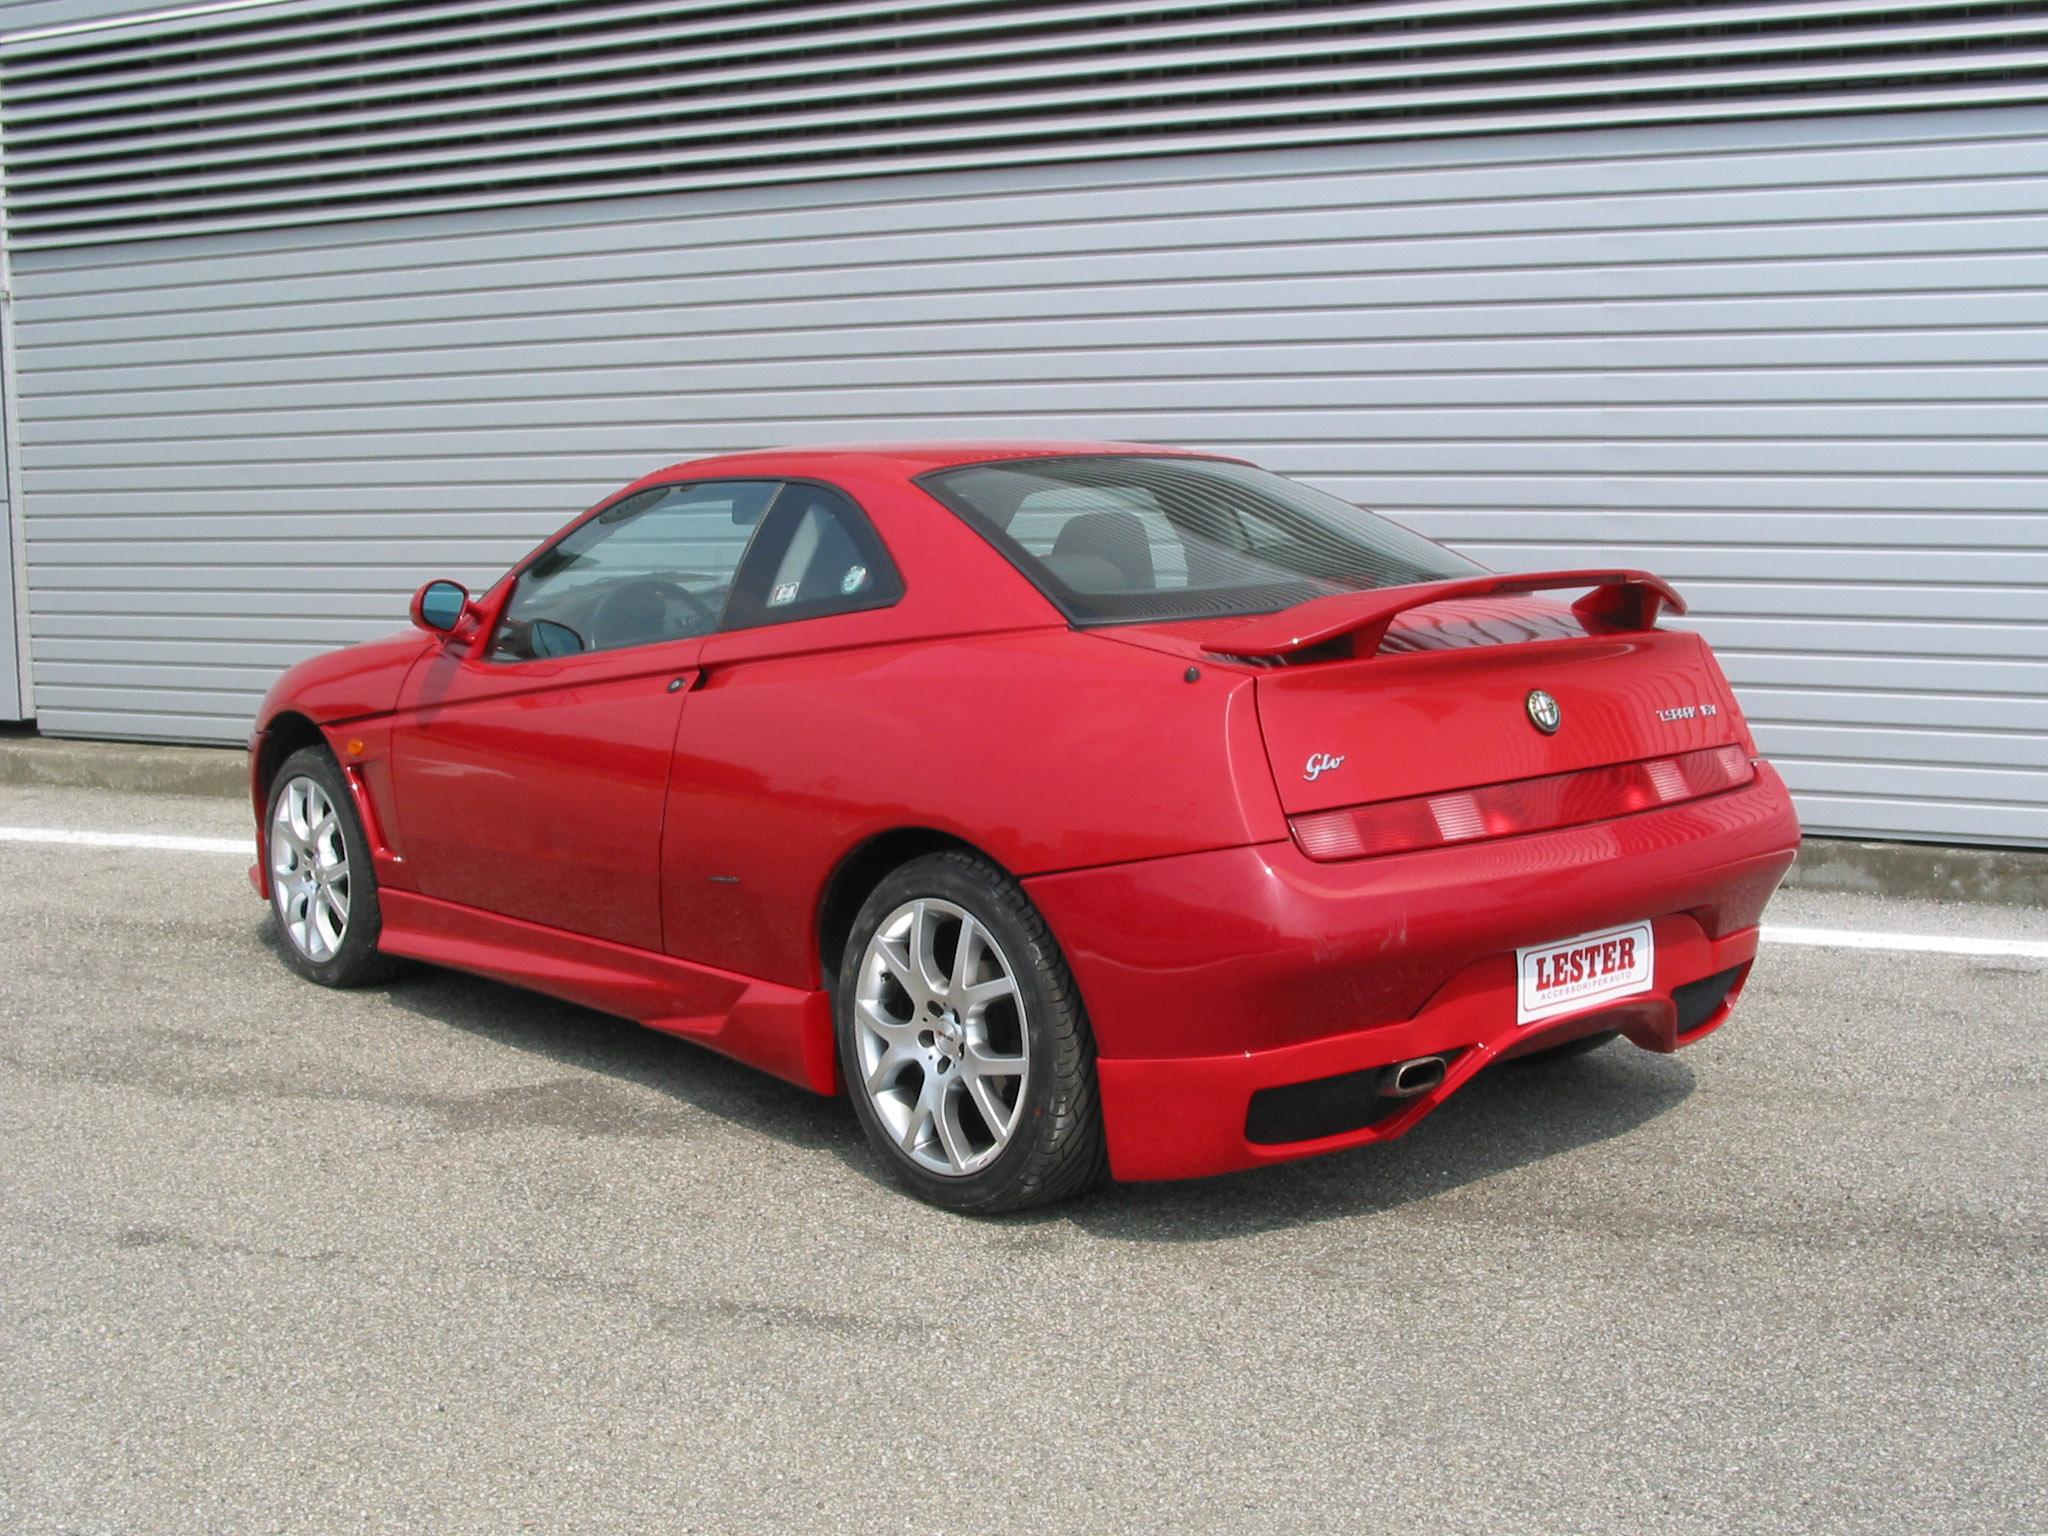 1998 Alfa Romeo Gtv Partsopen 916 Wiring Diagram Src